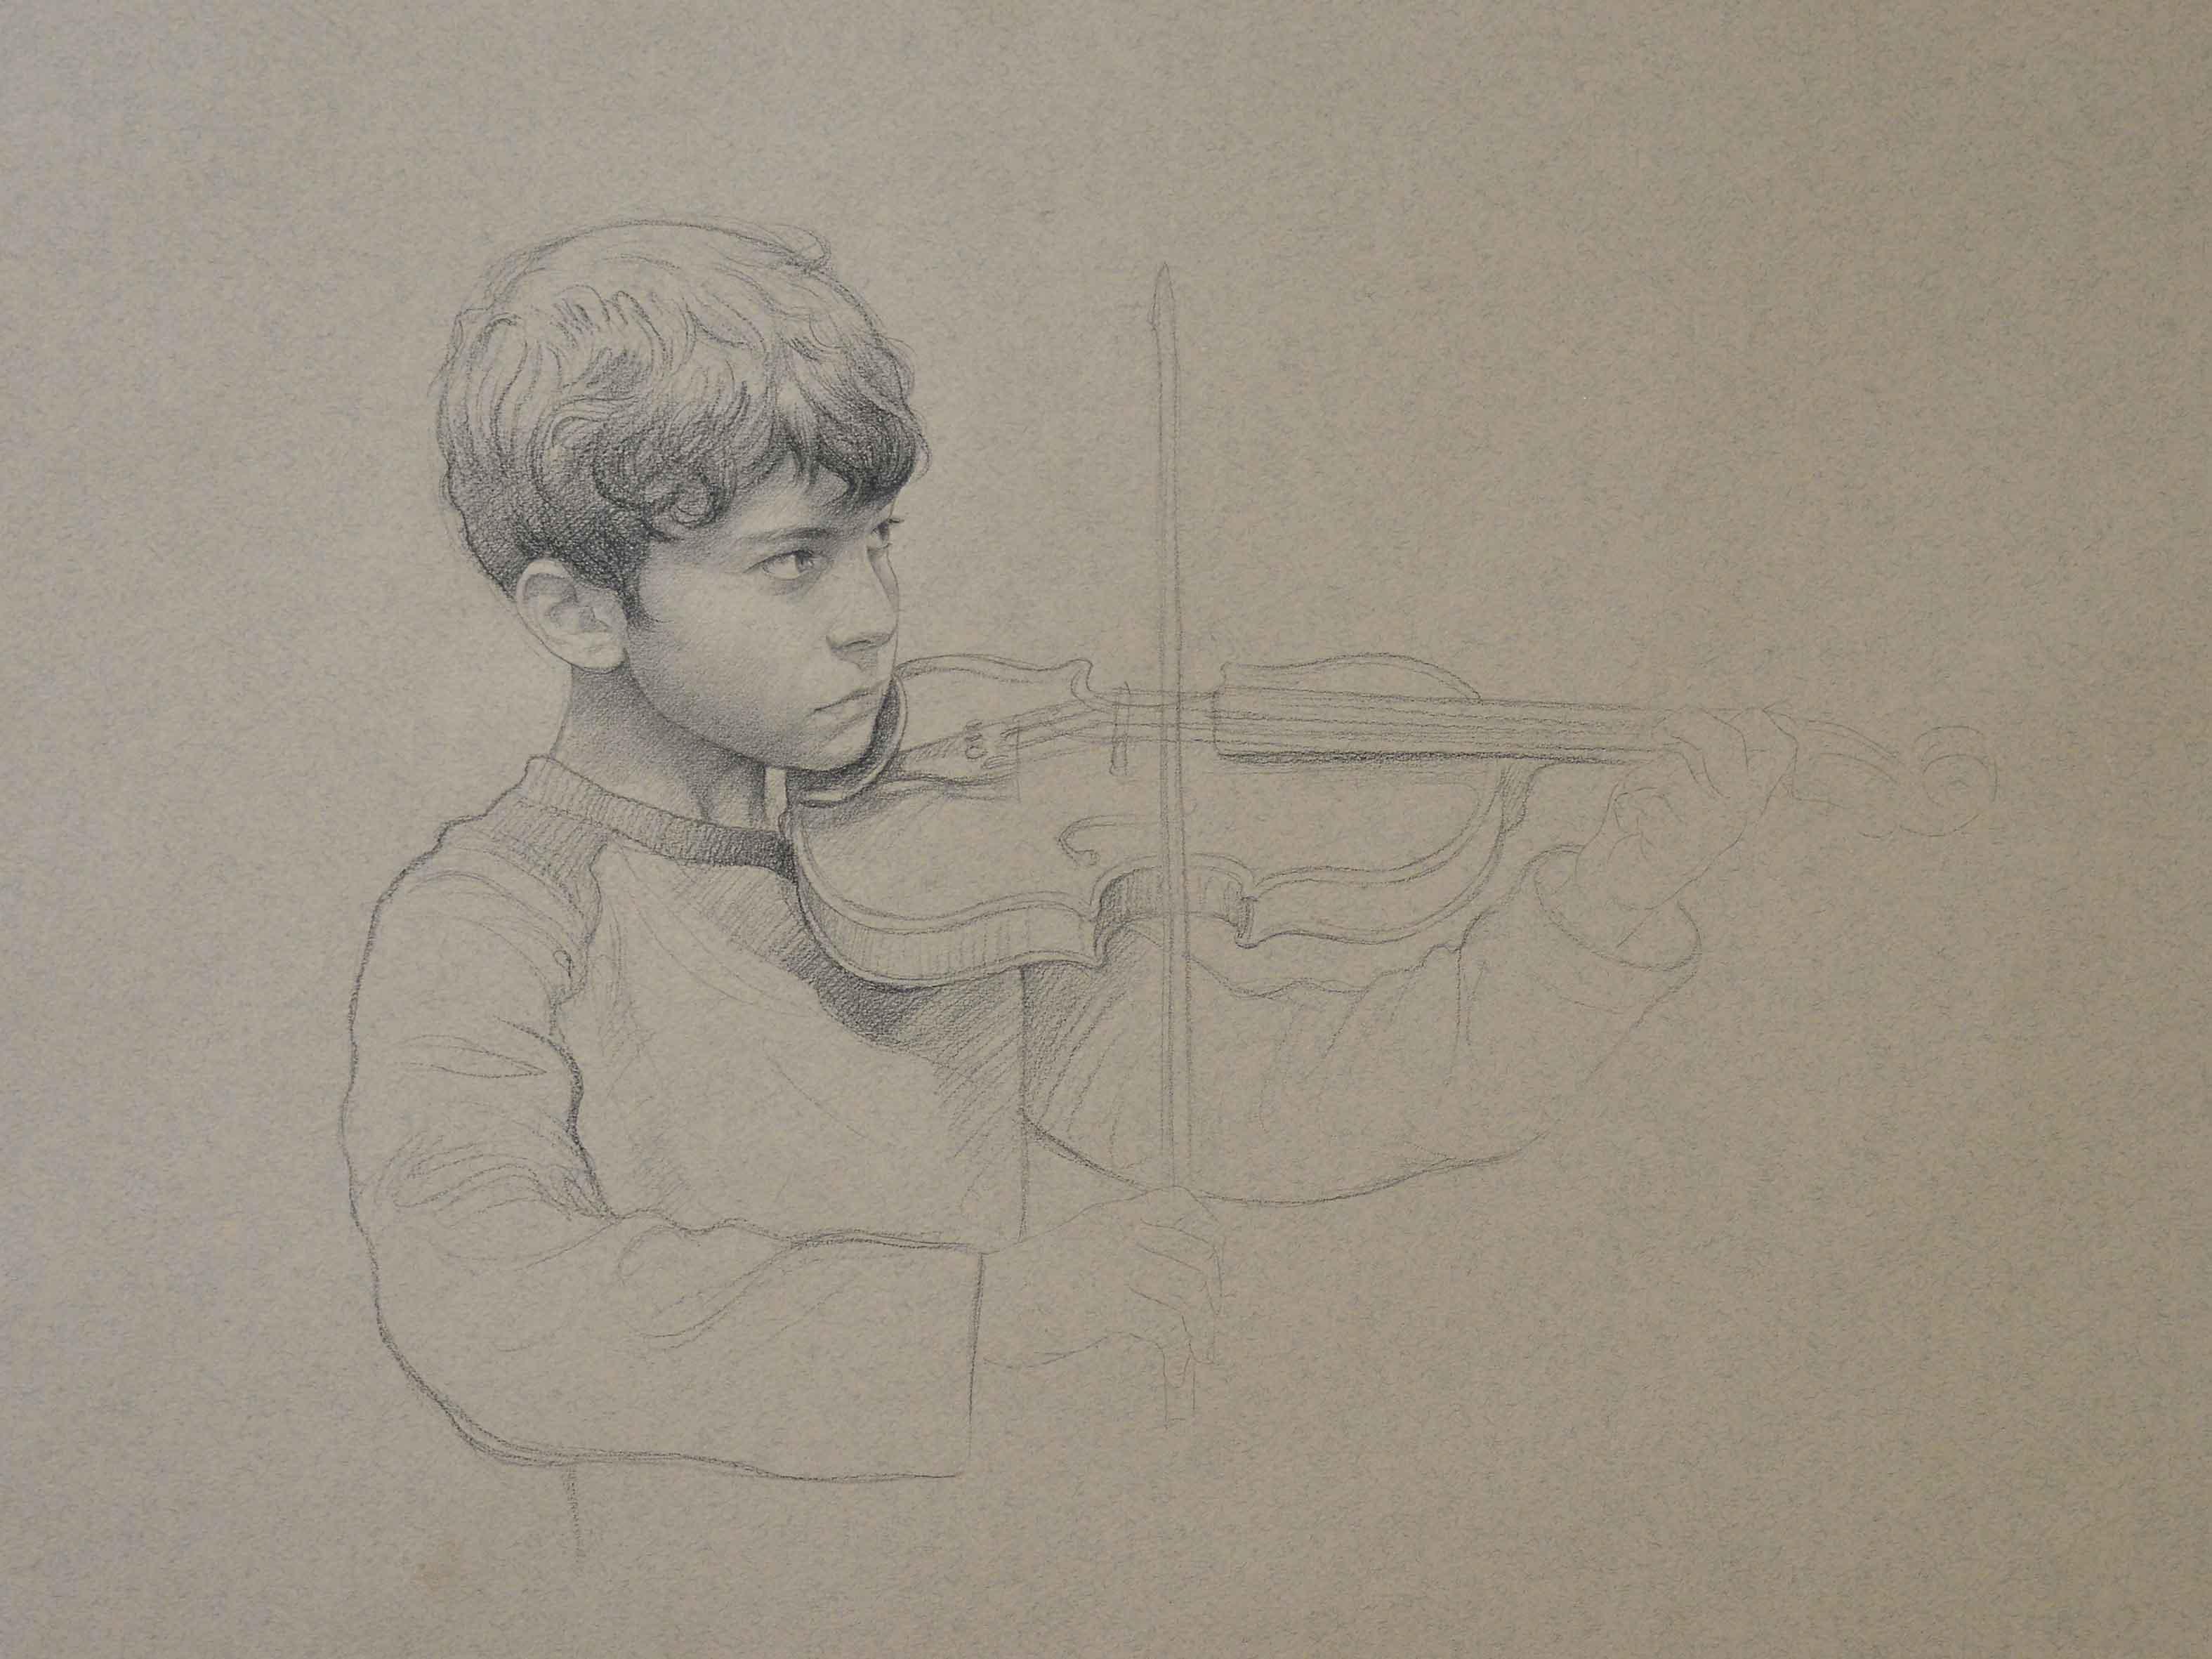 Little Musician, Conte on Paper, 30x40, 2009